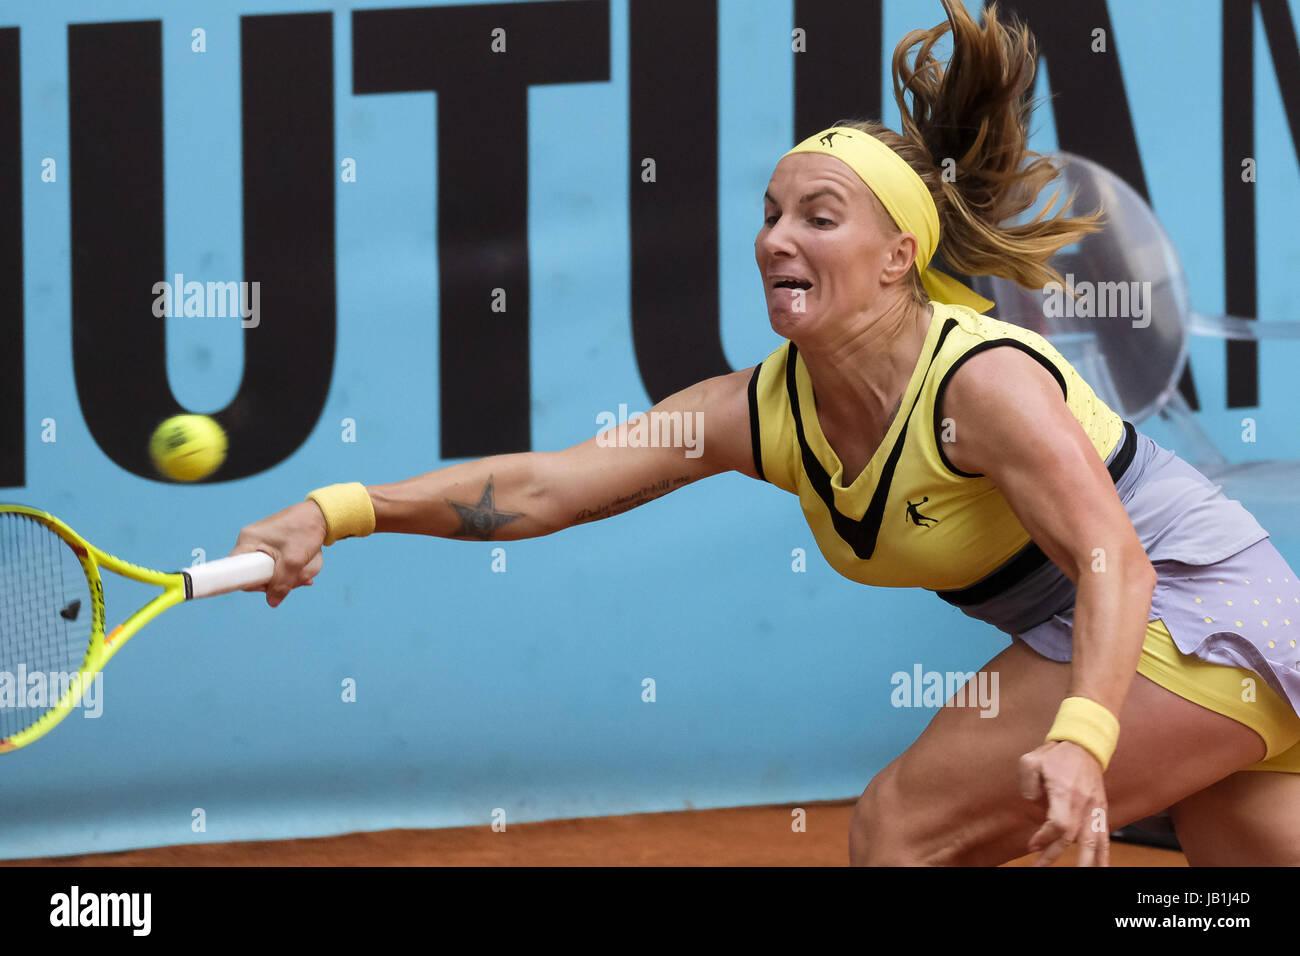 Svetlana Kuznetsova of Russia against Alison Riske of EEUU during